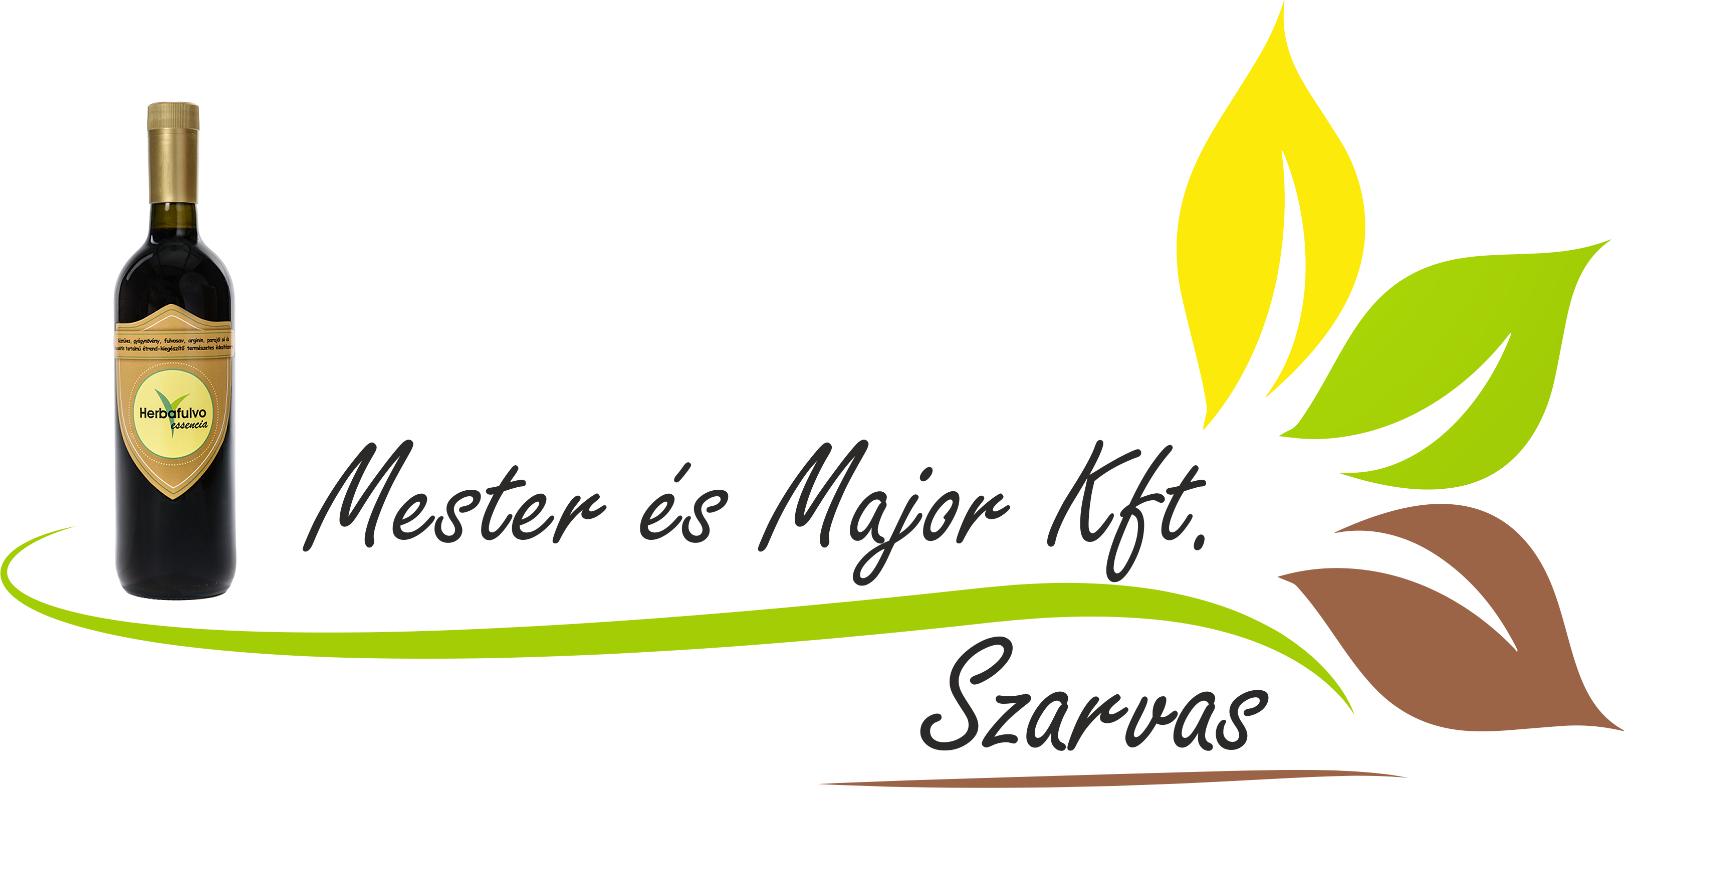 herbafulvo uveges logo